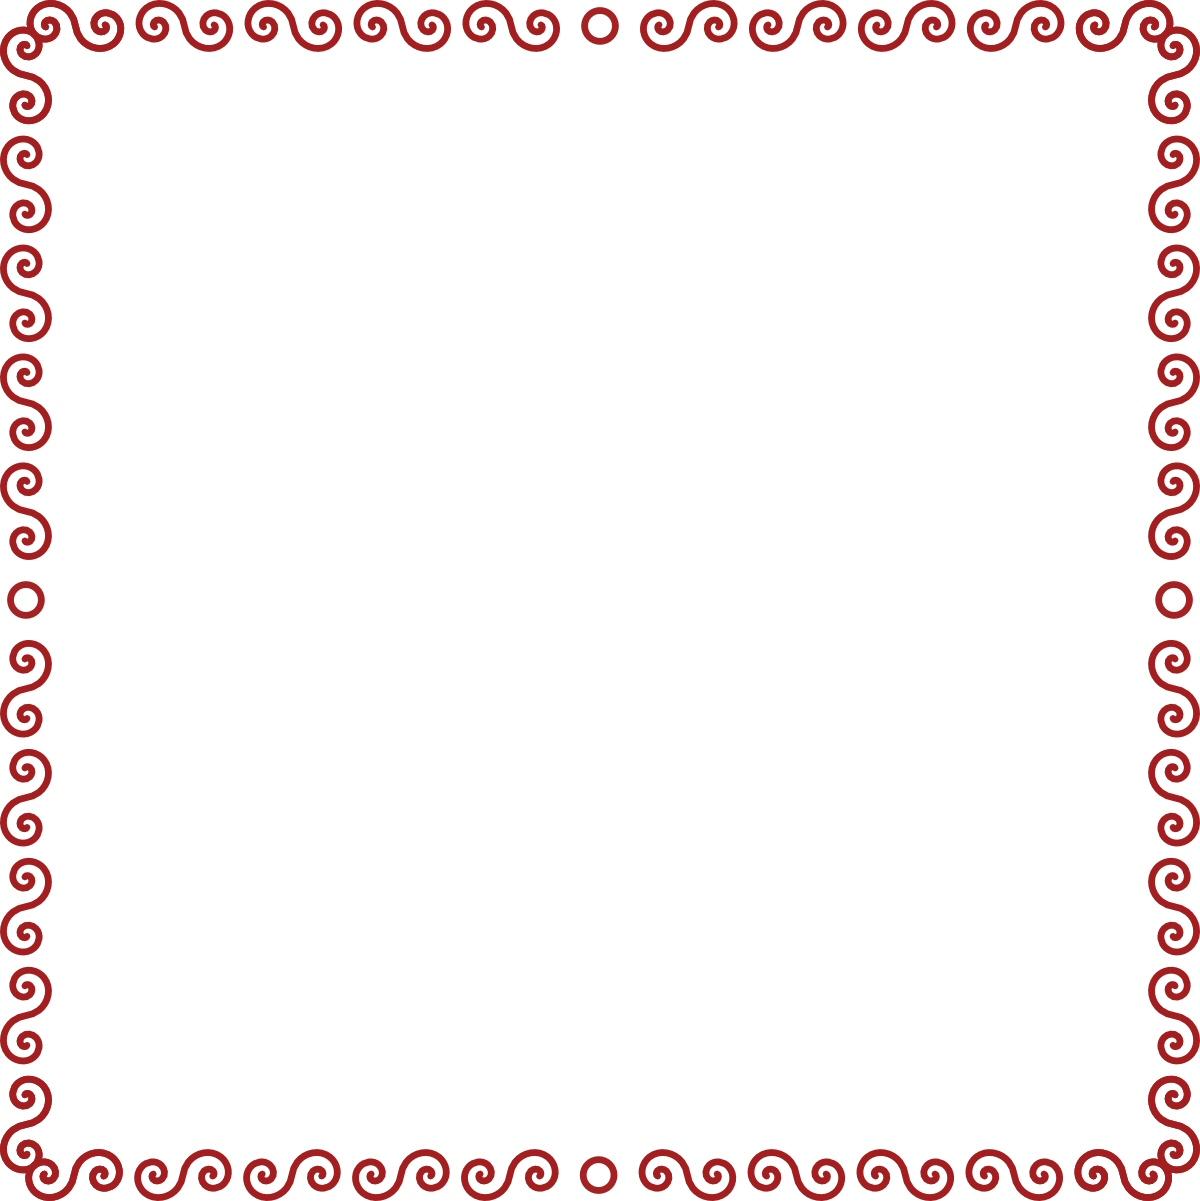 Red Swirl Border